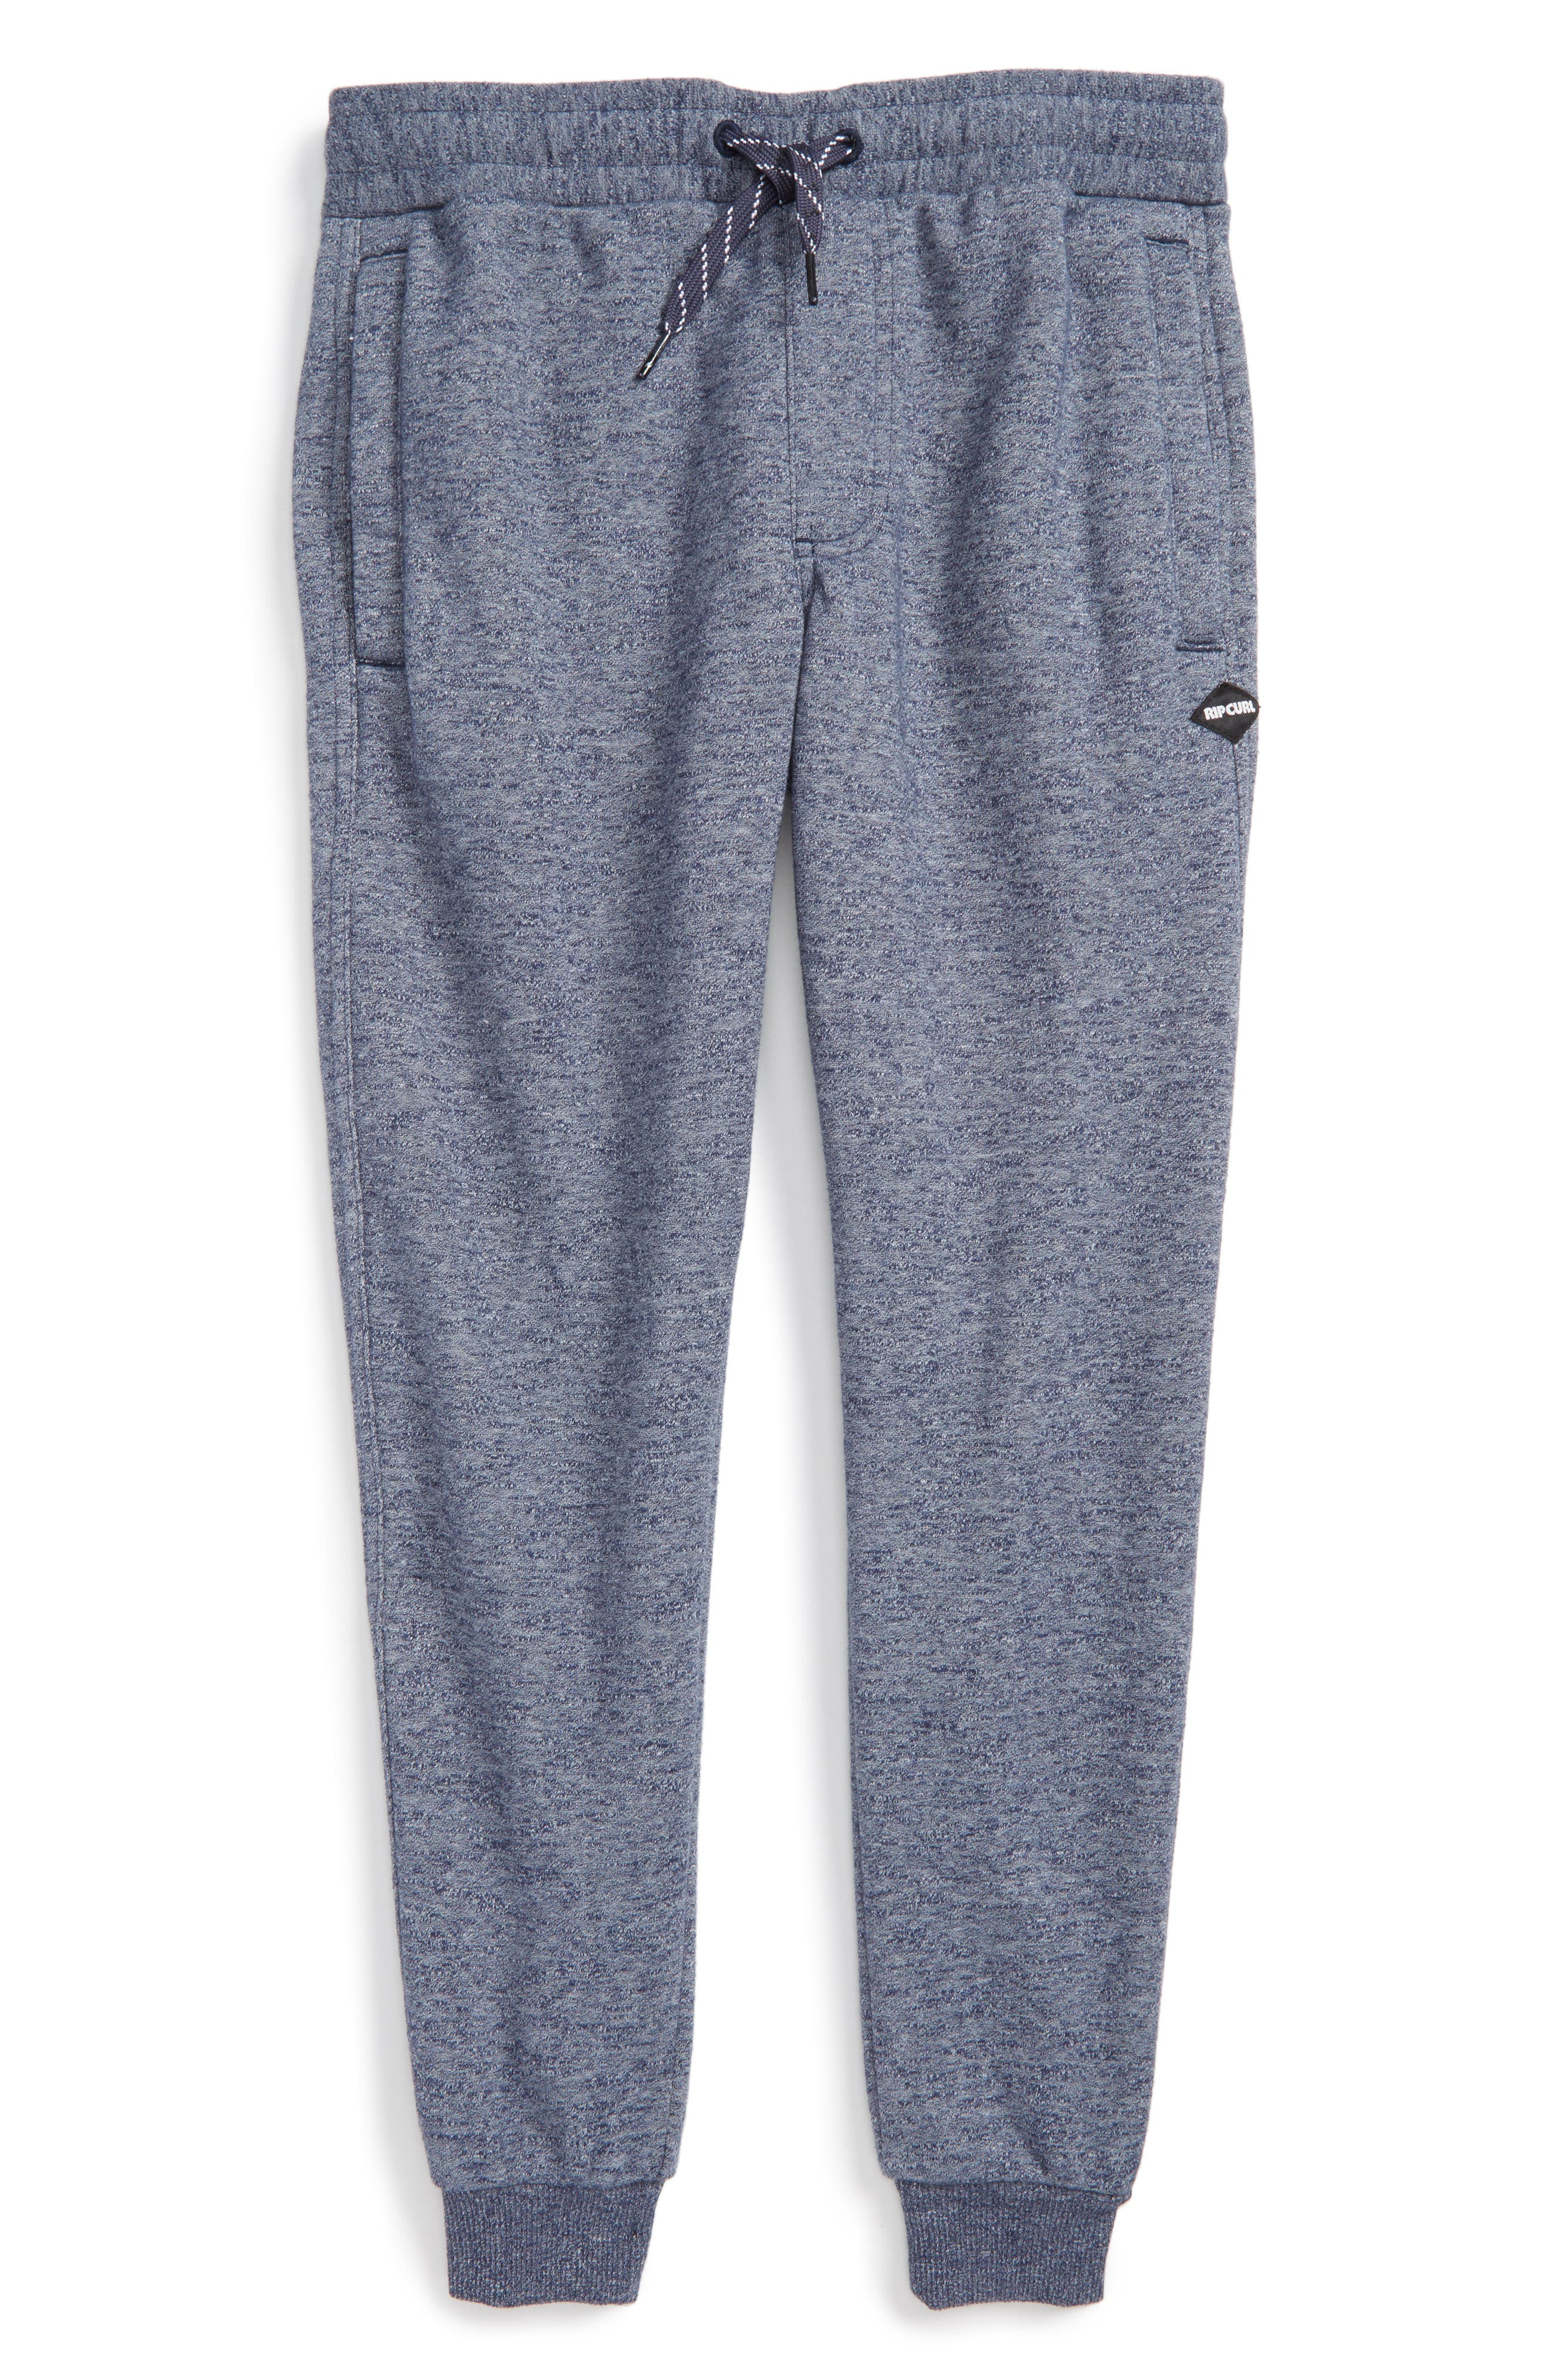 Destination Fleece Sweatpants,                         Main,                         color, Navy